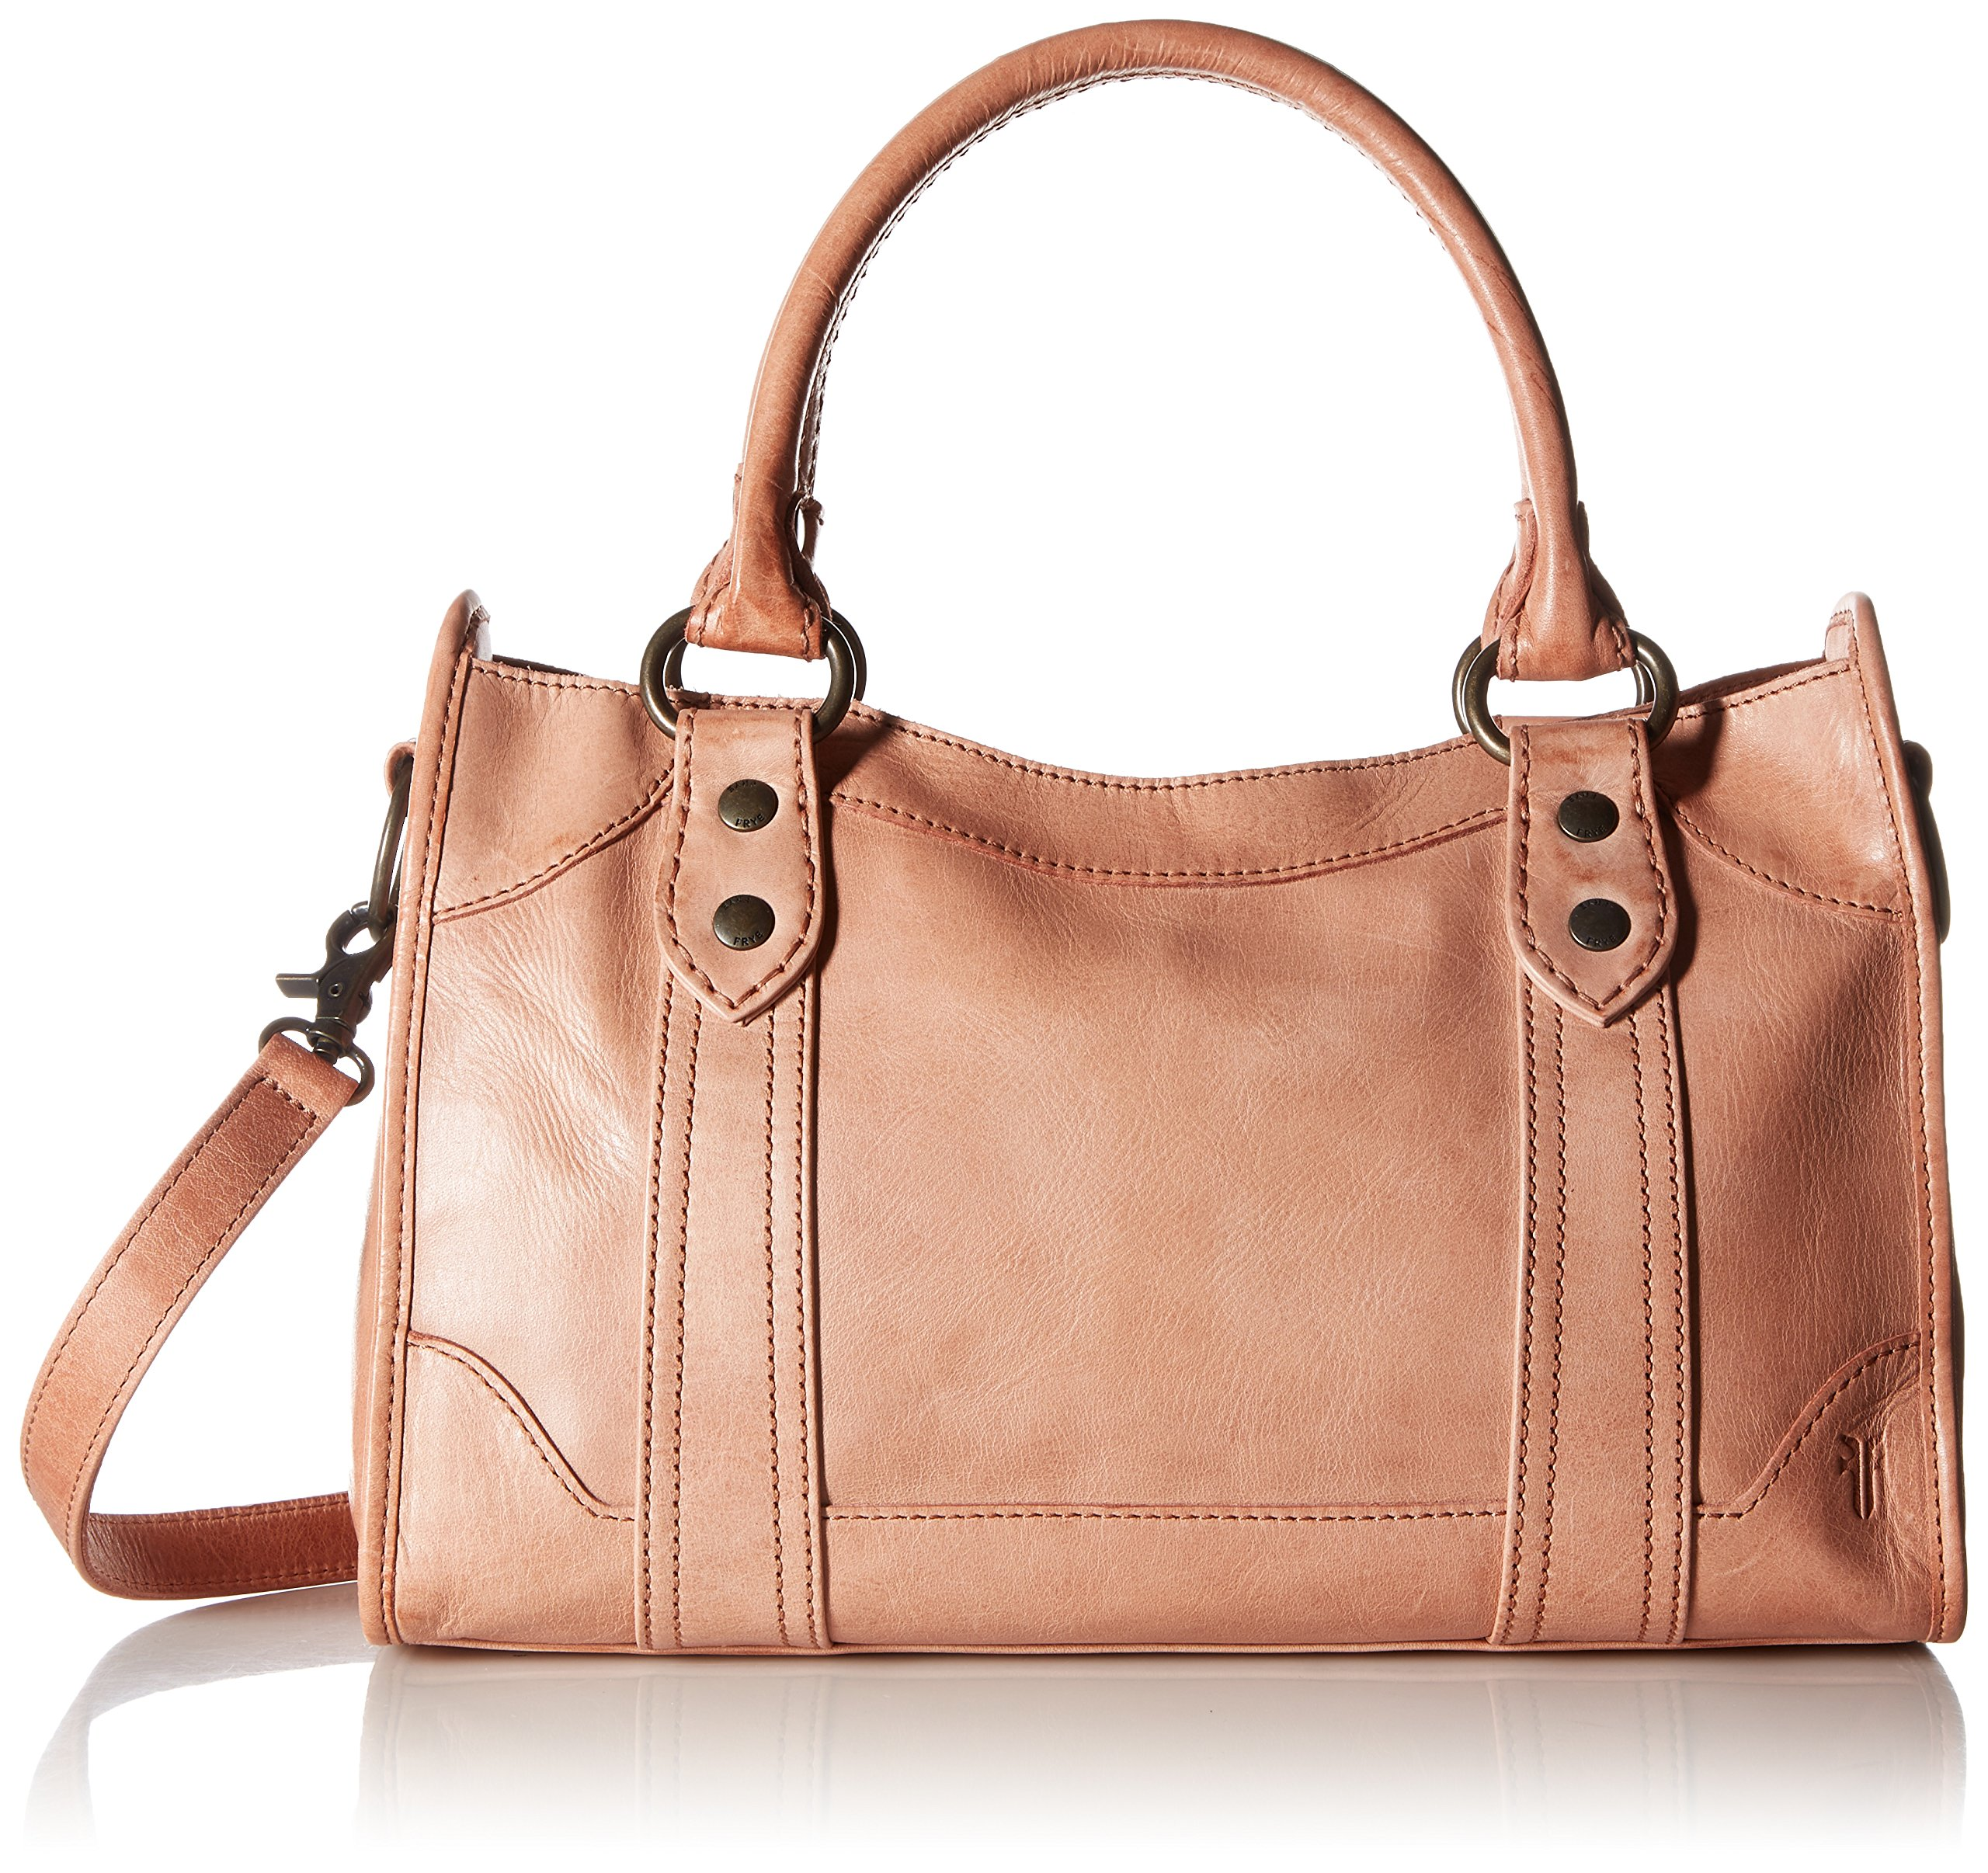 FRYE Melissa Zip Satchel Leather Handbag, dusty rose by FRYE (Image #1)